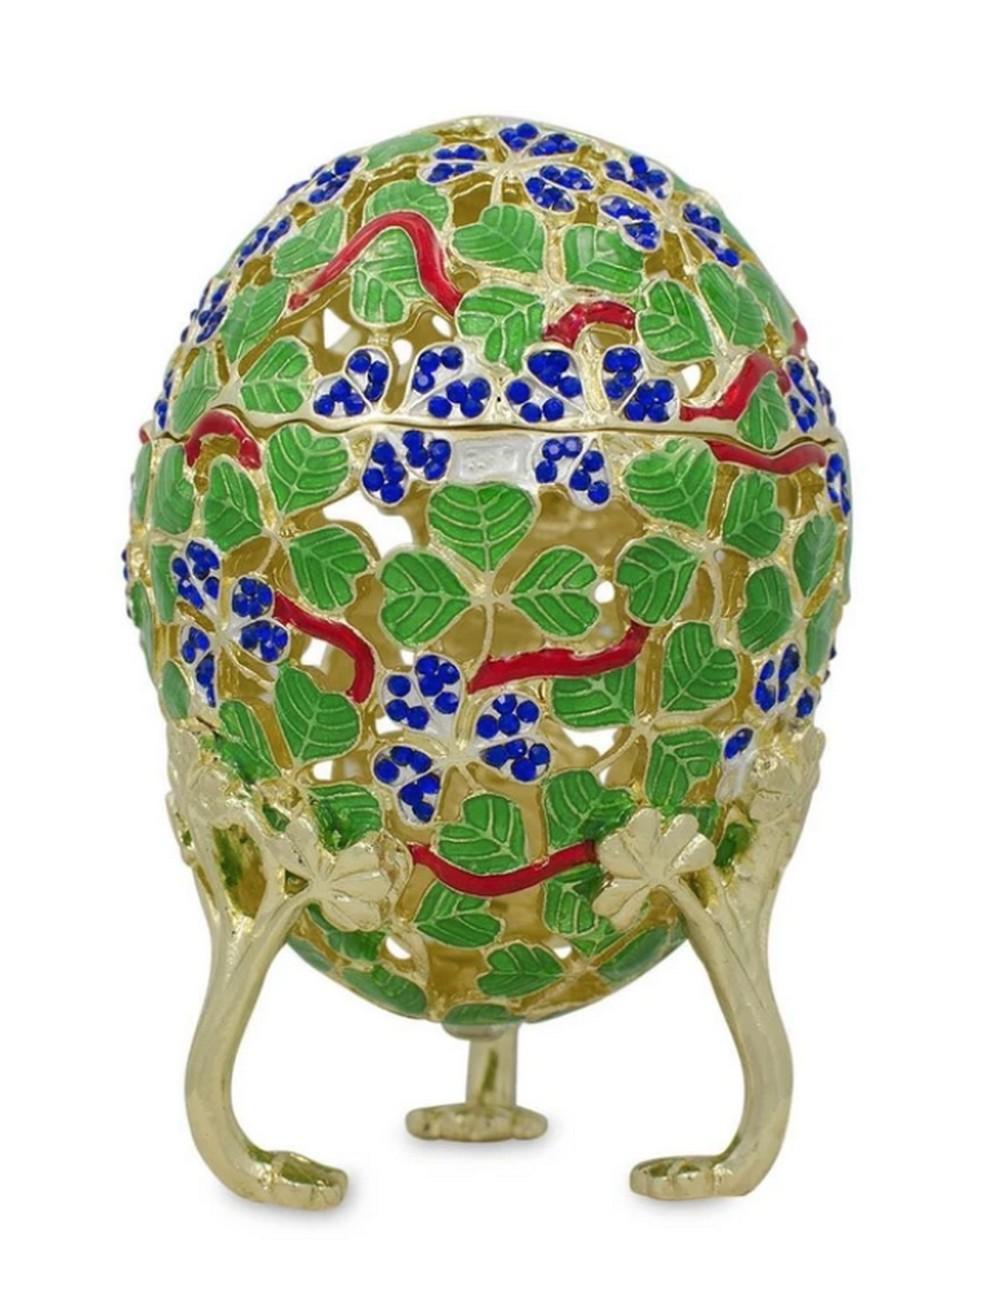 1902 Royal Green Clover Leaf Russian Inspired Egg